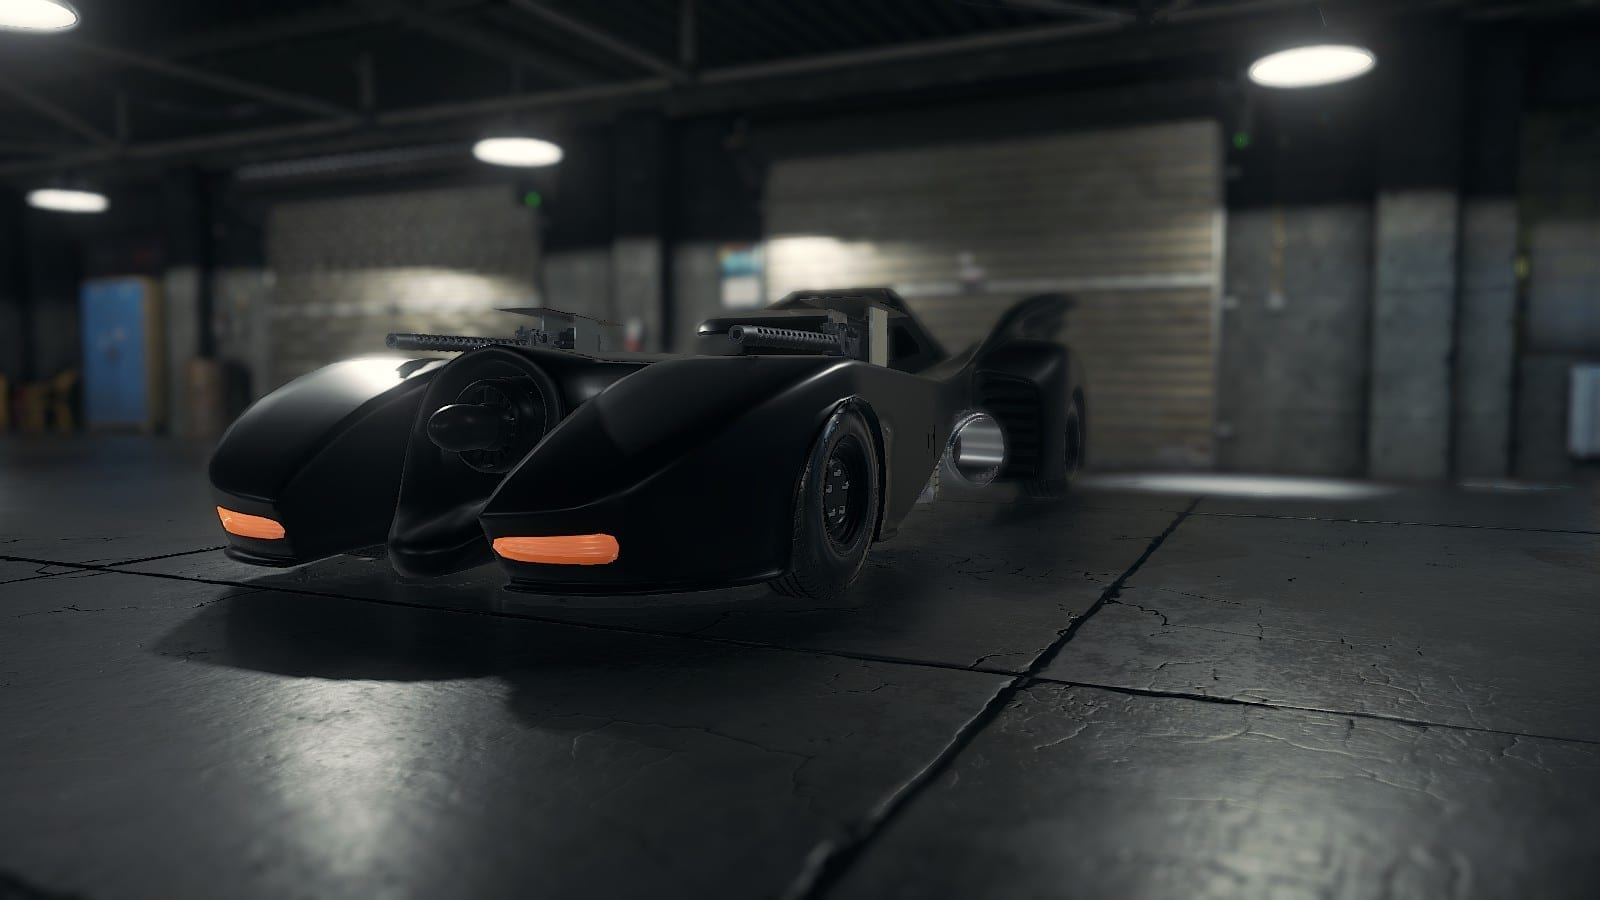 1989 Batmobile Mod for Car Mechanic Simulator 2018